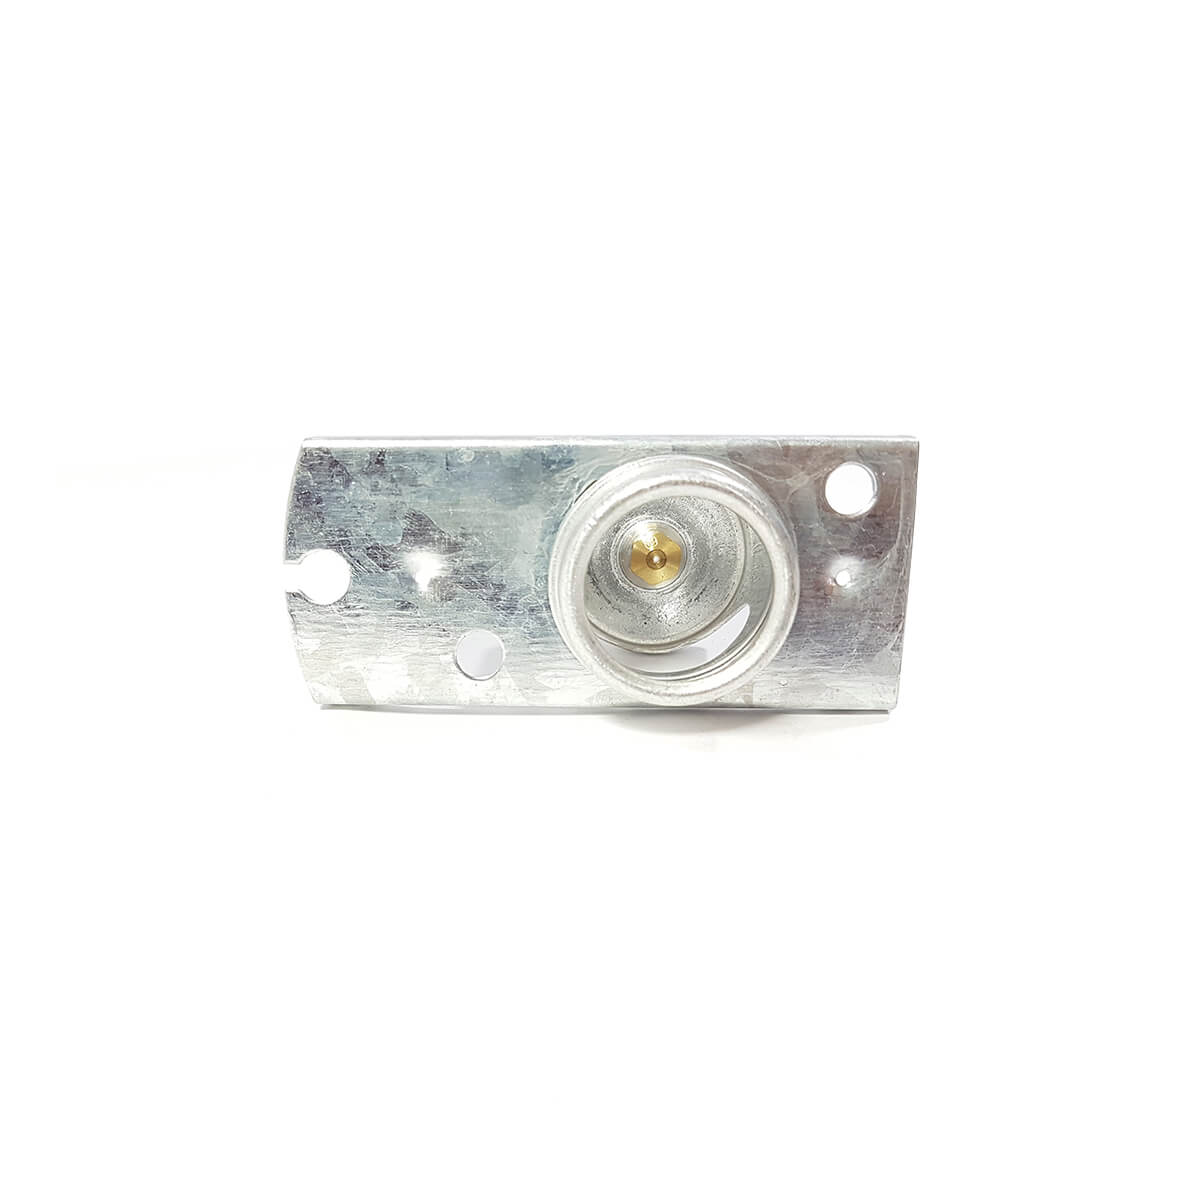 Venturi Queimador Rápido Para Fogão Electrolux 76DAB 76SQB 76USQ 76DBA - 72001730